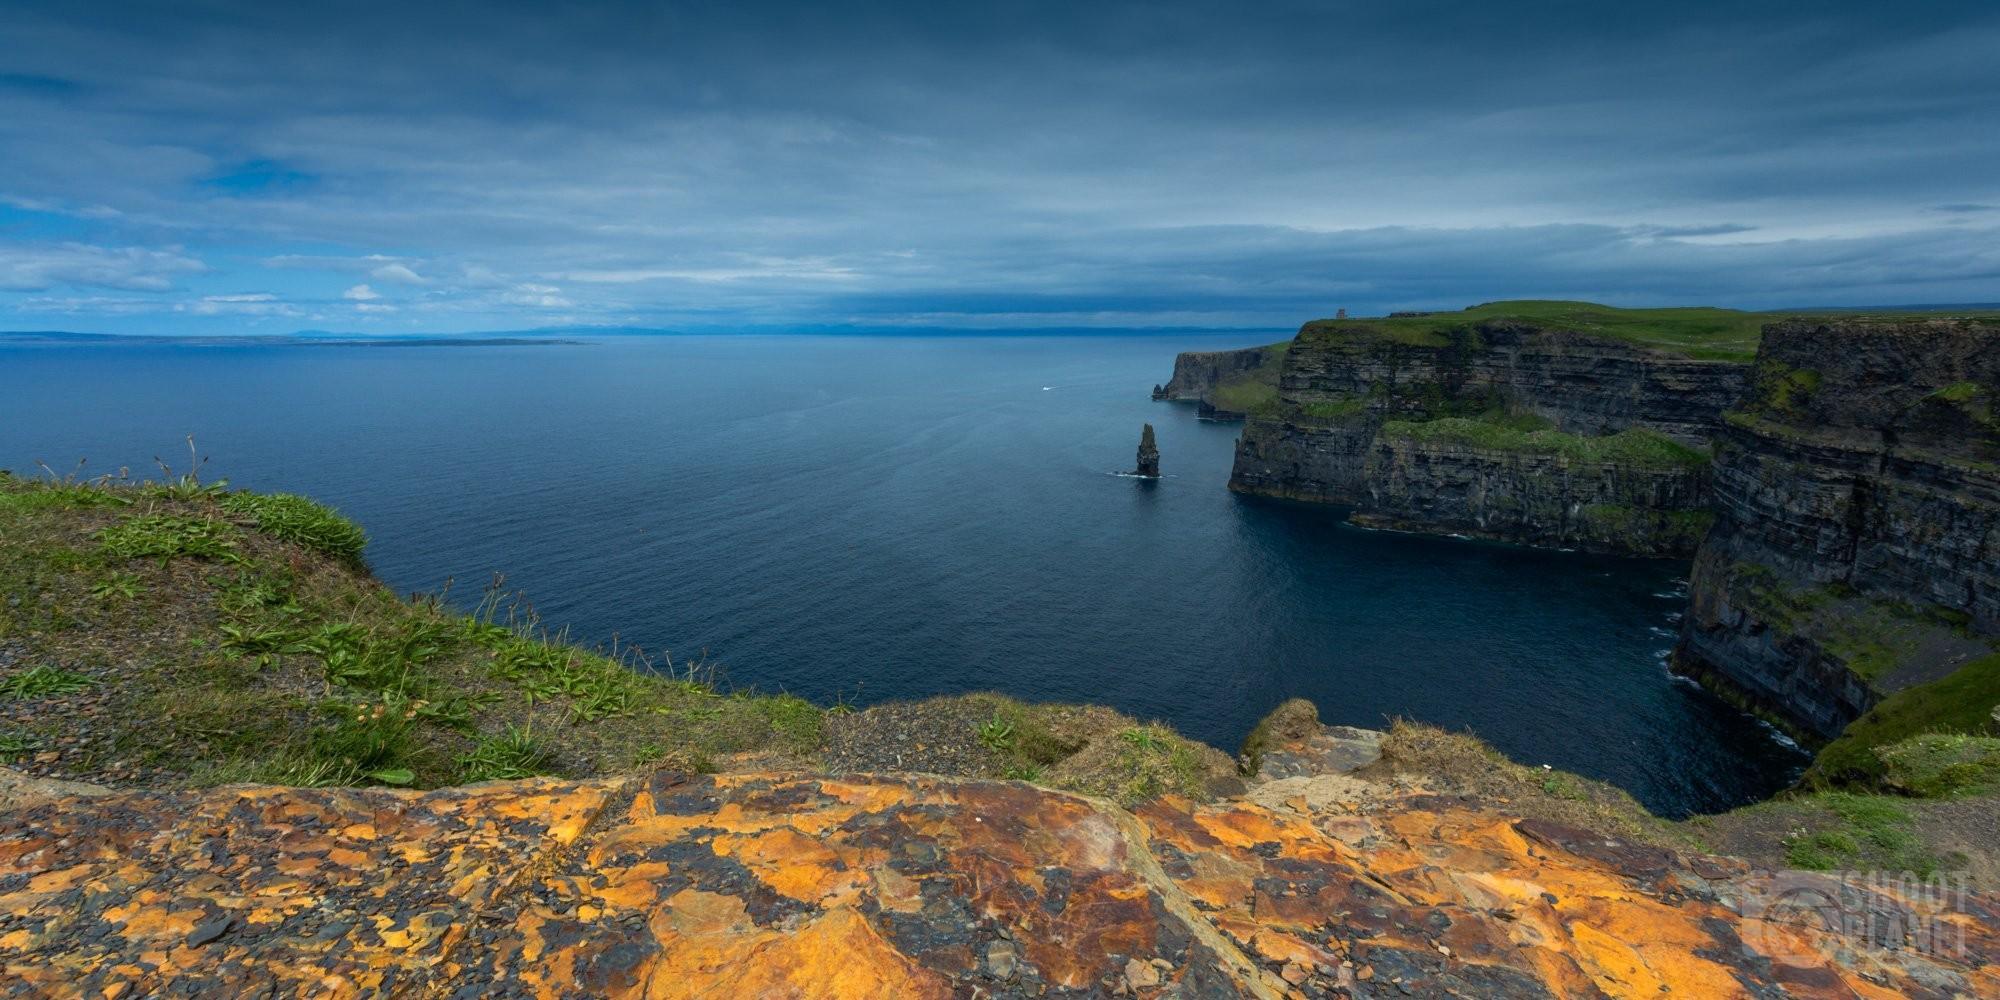 Cliffs of Moher cloudy sky landscape, Ireland